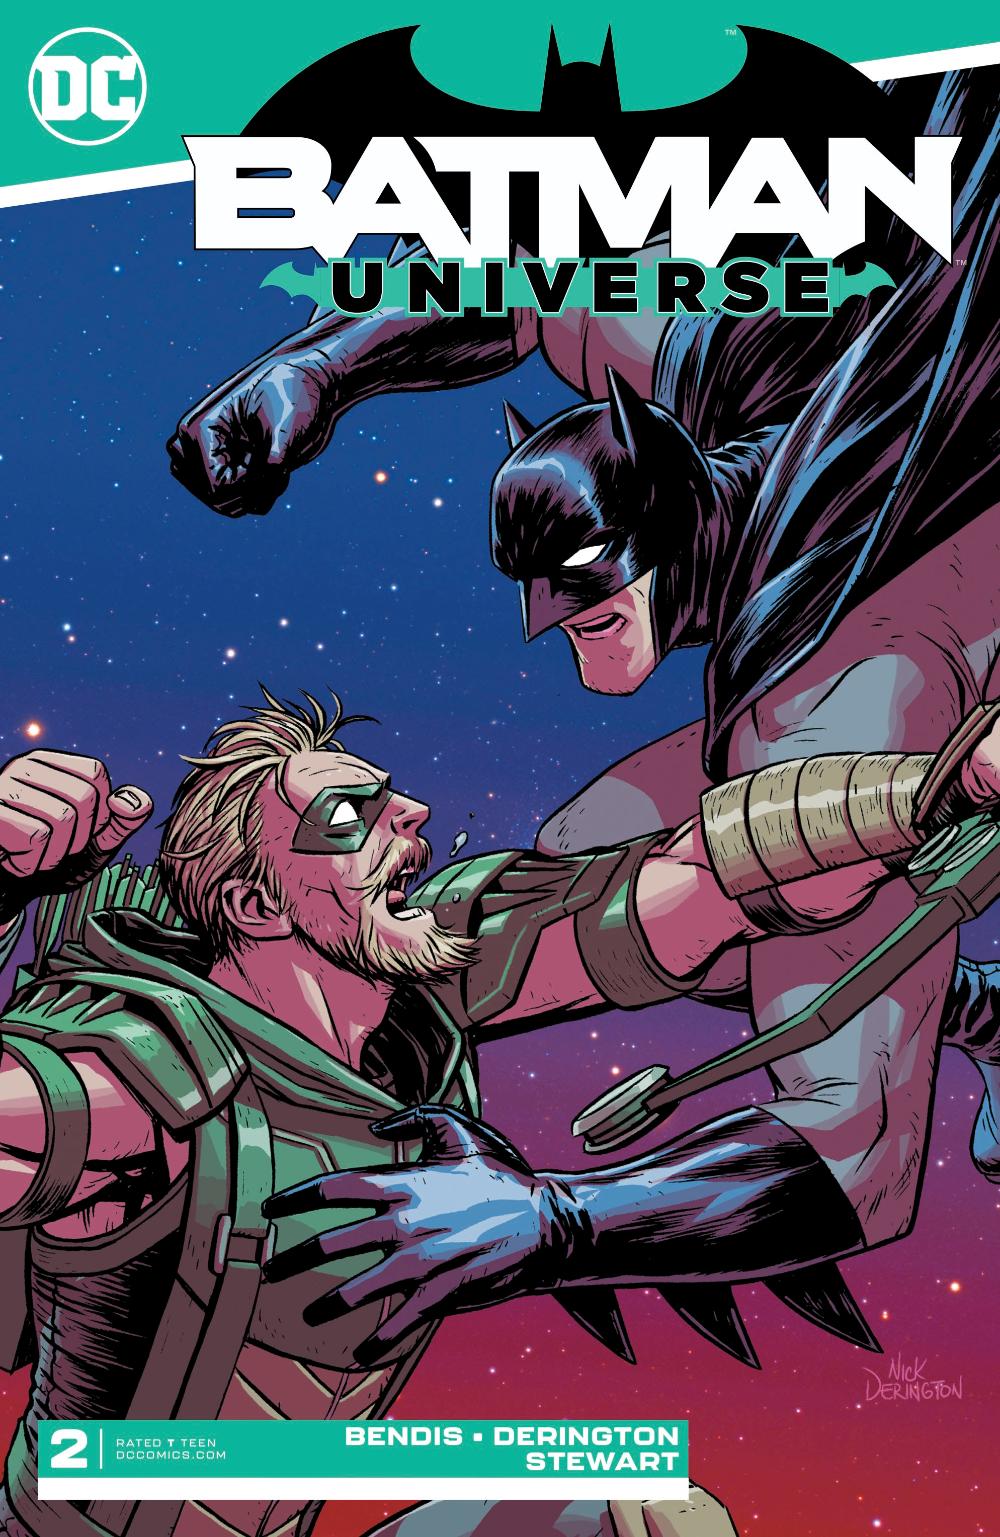 Batman Universe Issue 2 Read Batman Universe Issue 2 Comic Online In High Quality Batman Universe Batman Dc Comics Art